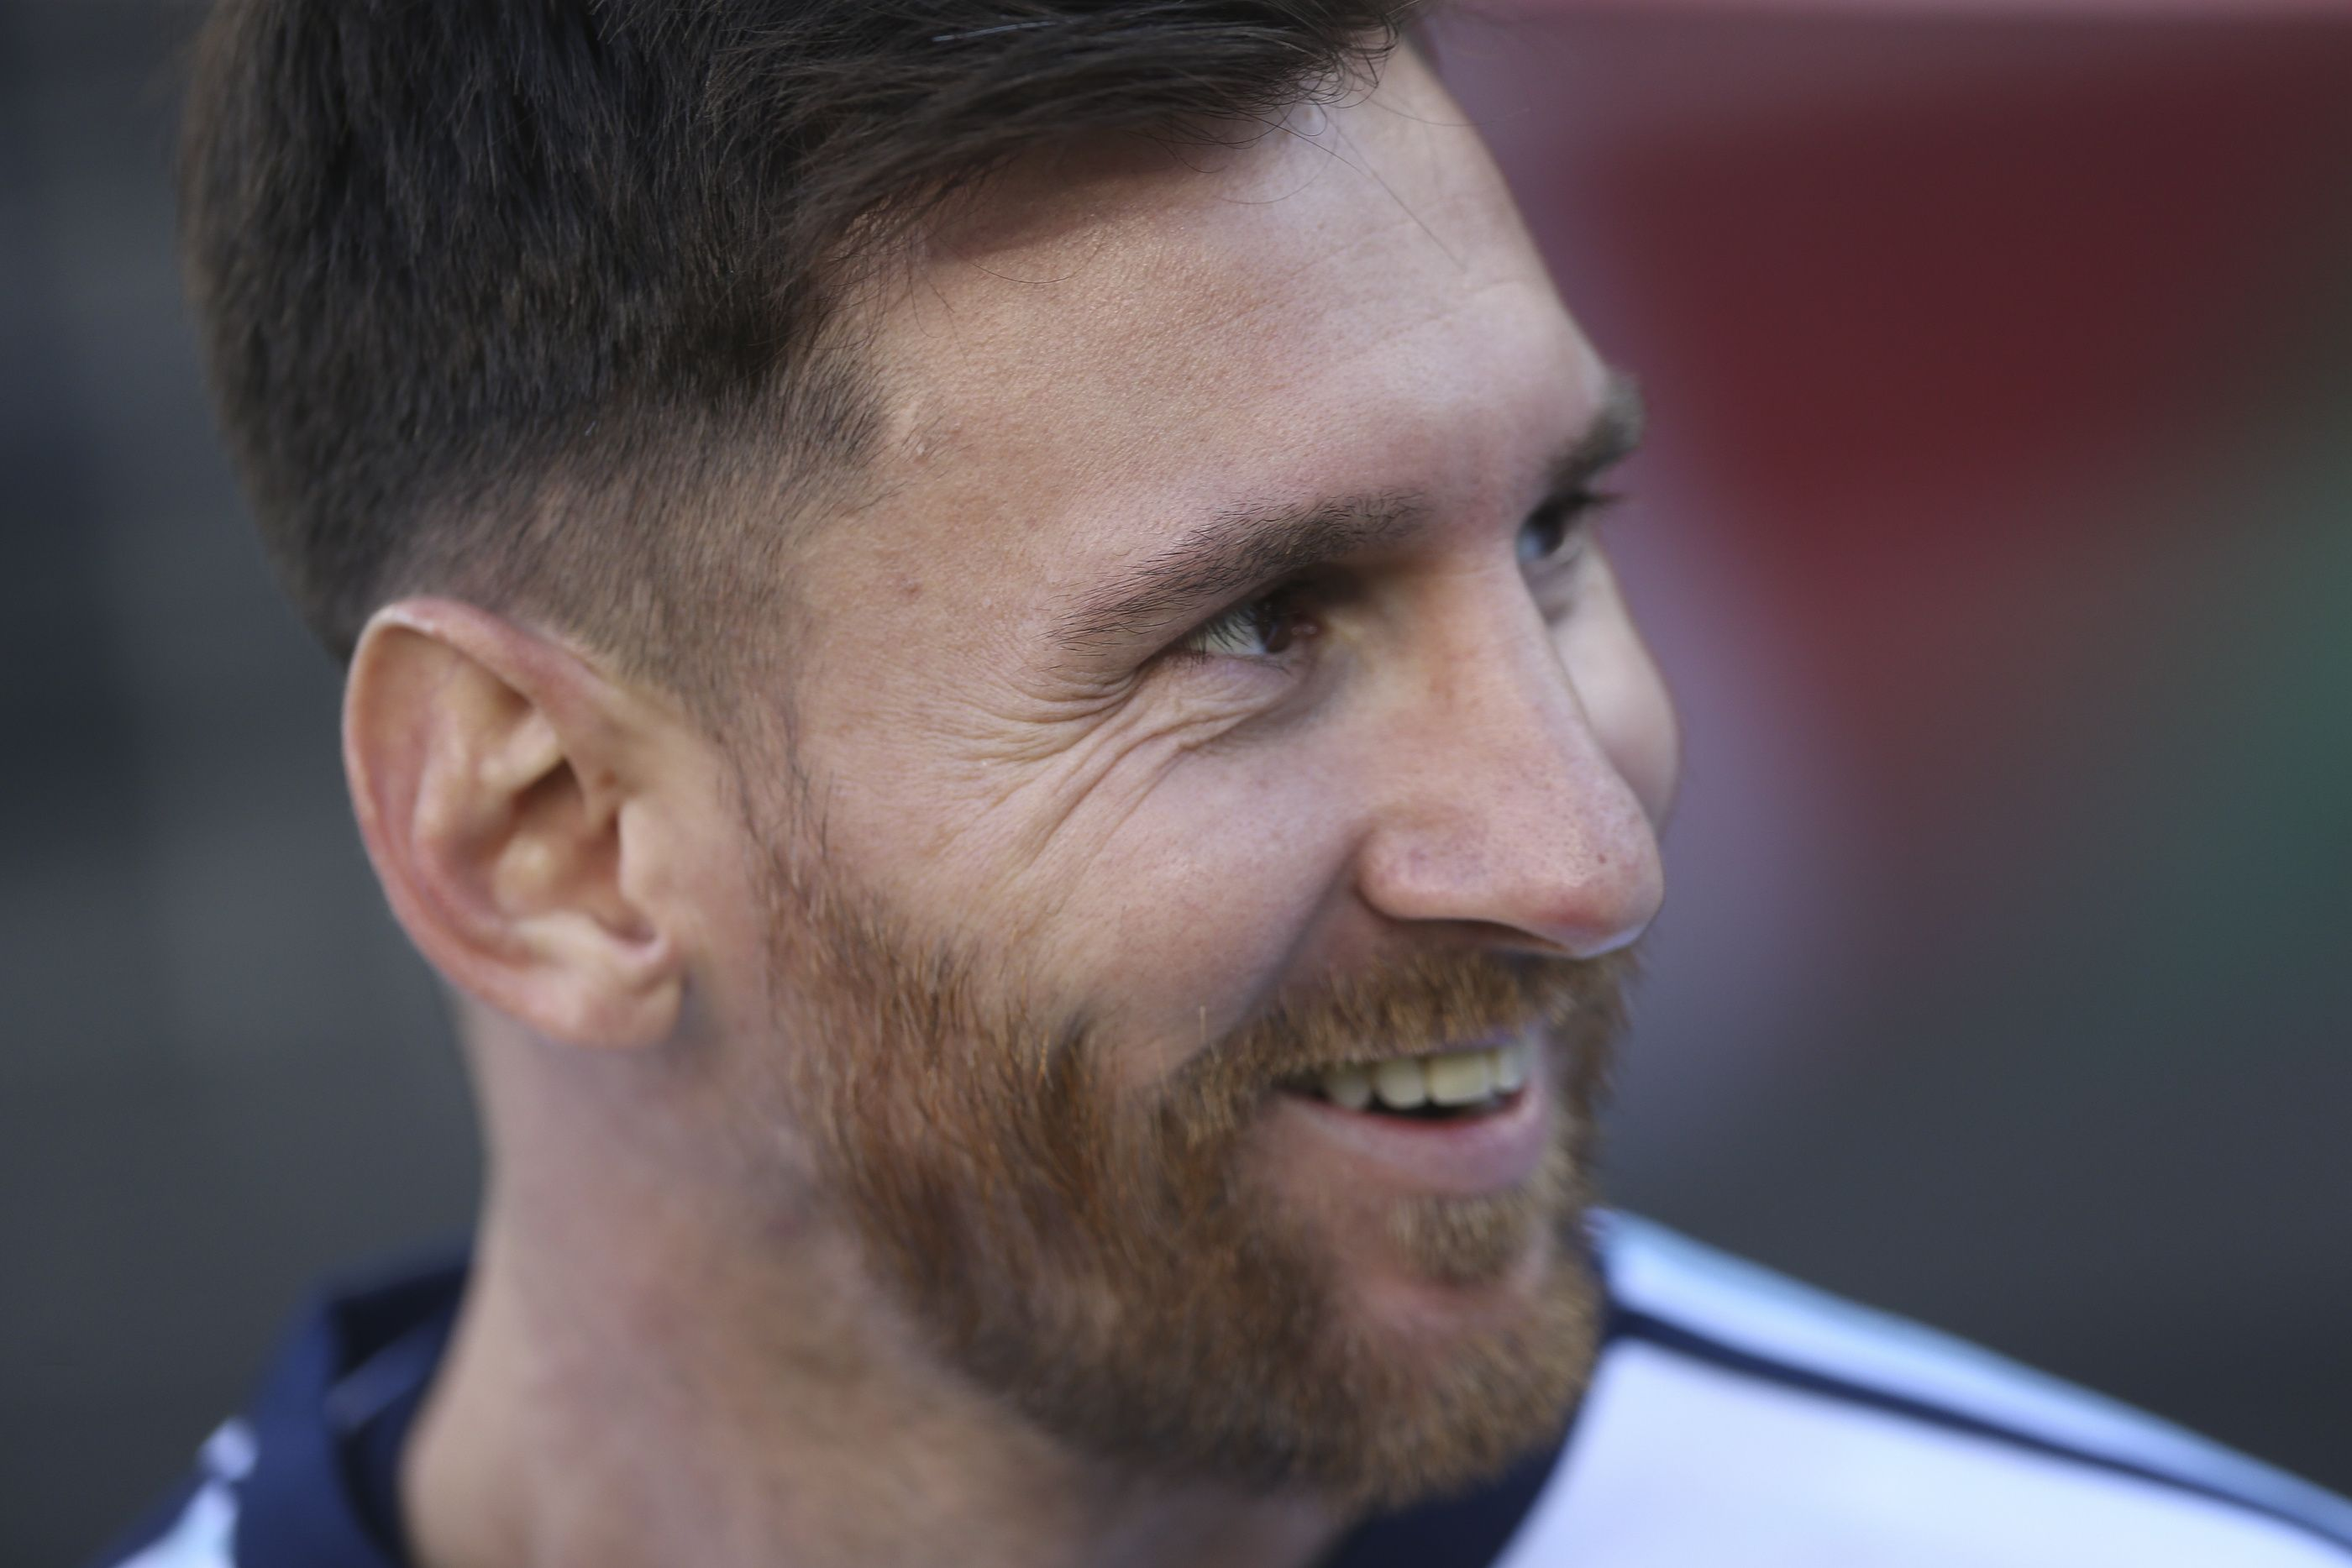 ¿La cábala de Messi? Si me saco la barba me matan